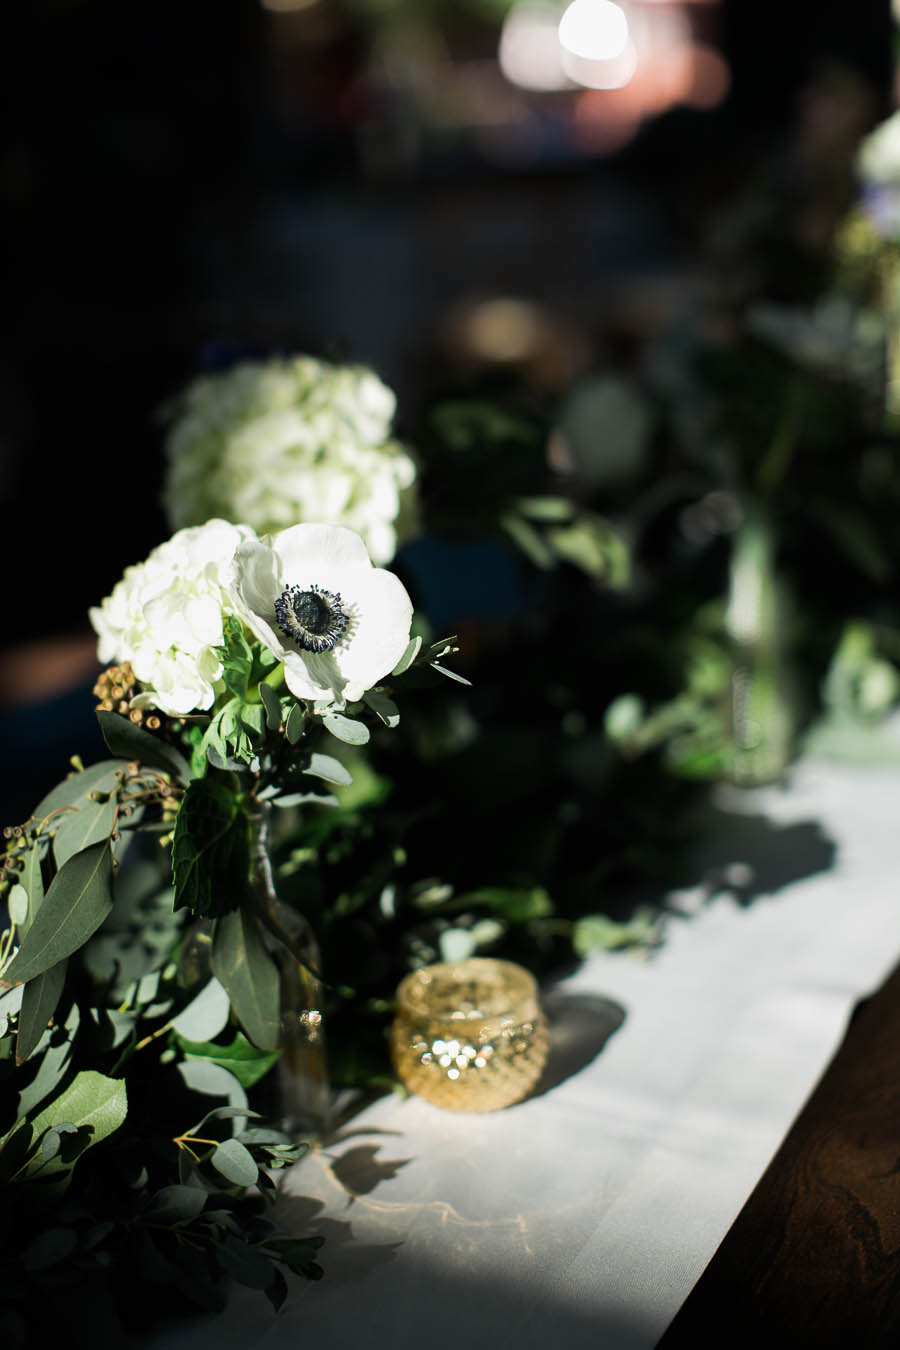 chattanooga film wedding photographer documentary natural gentle real life ©2016abigailbobophotography-34.jpg